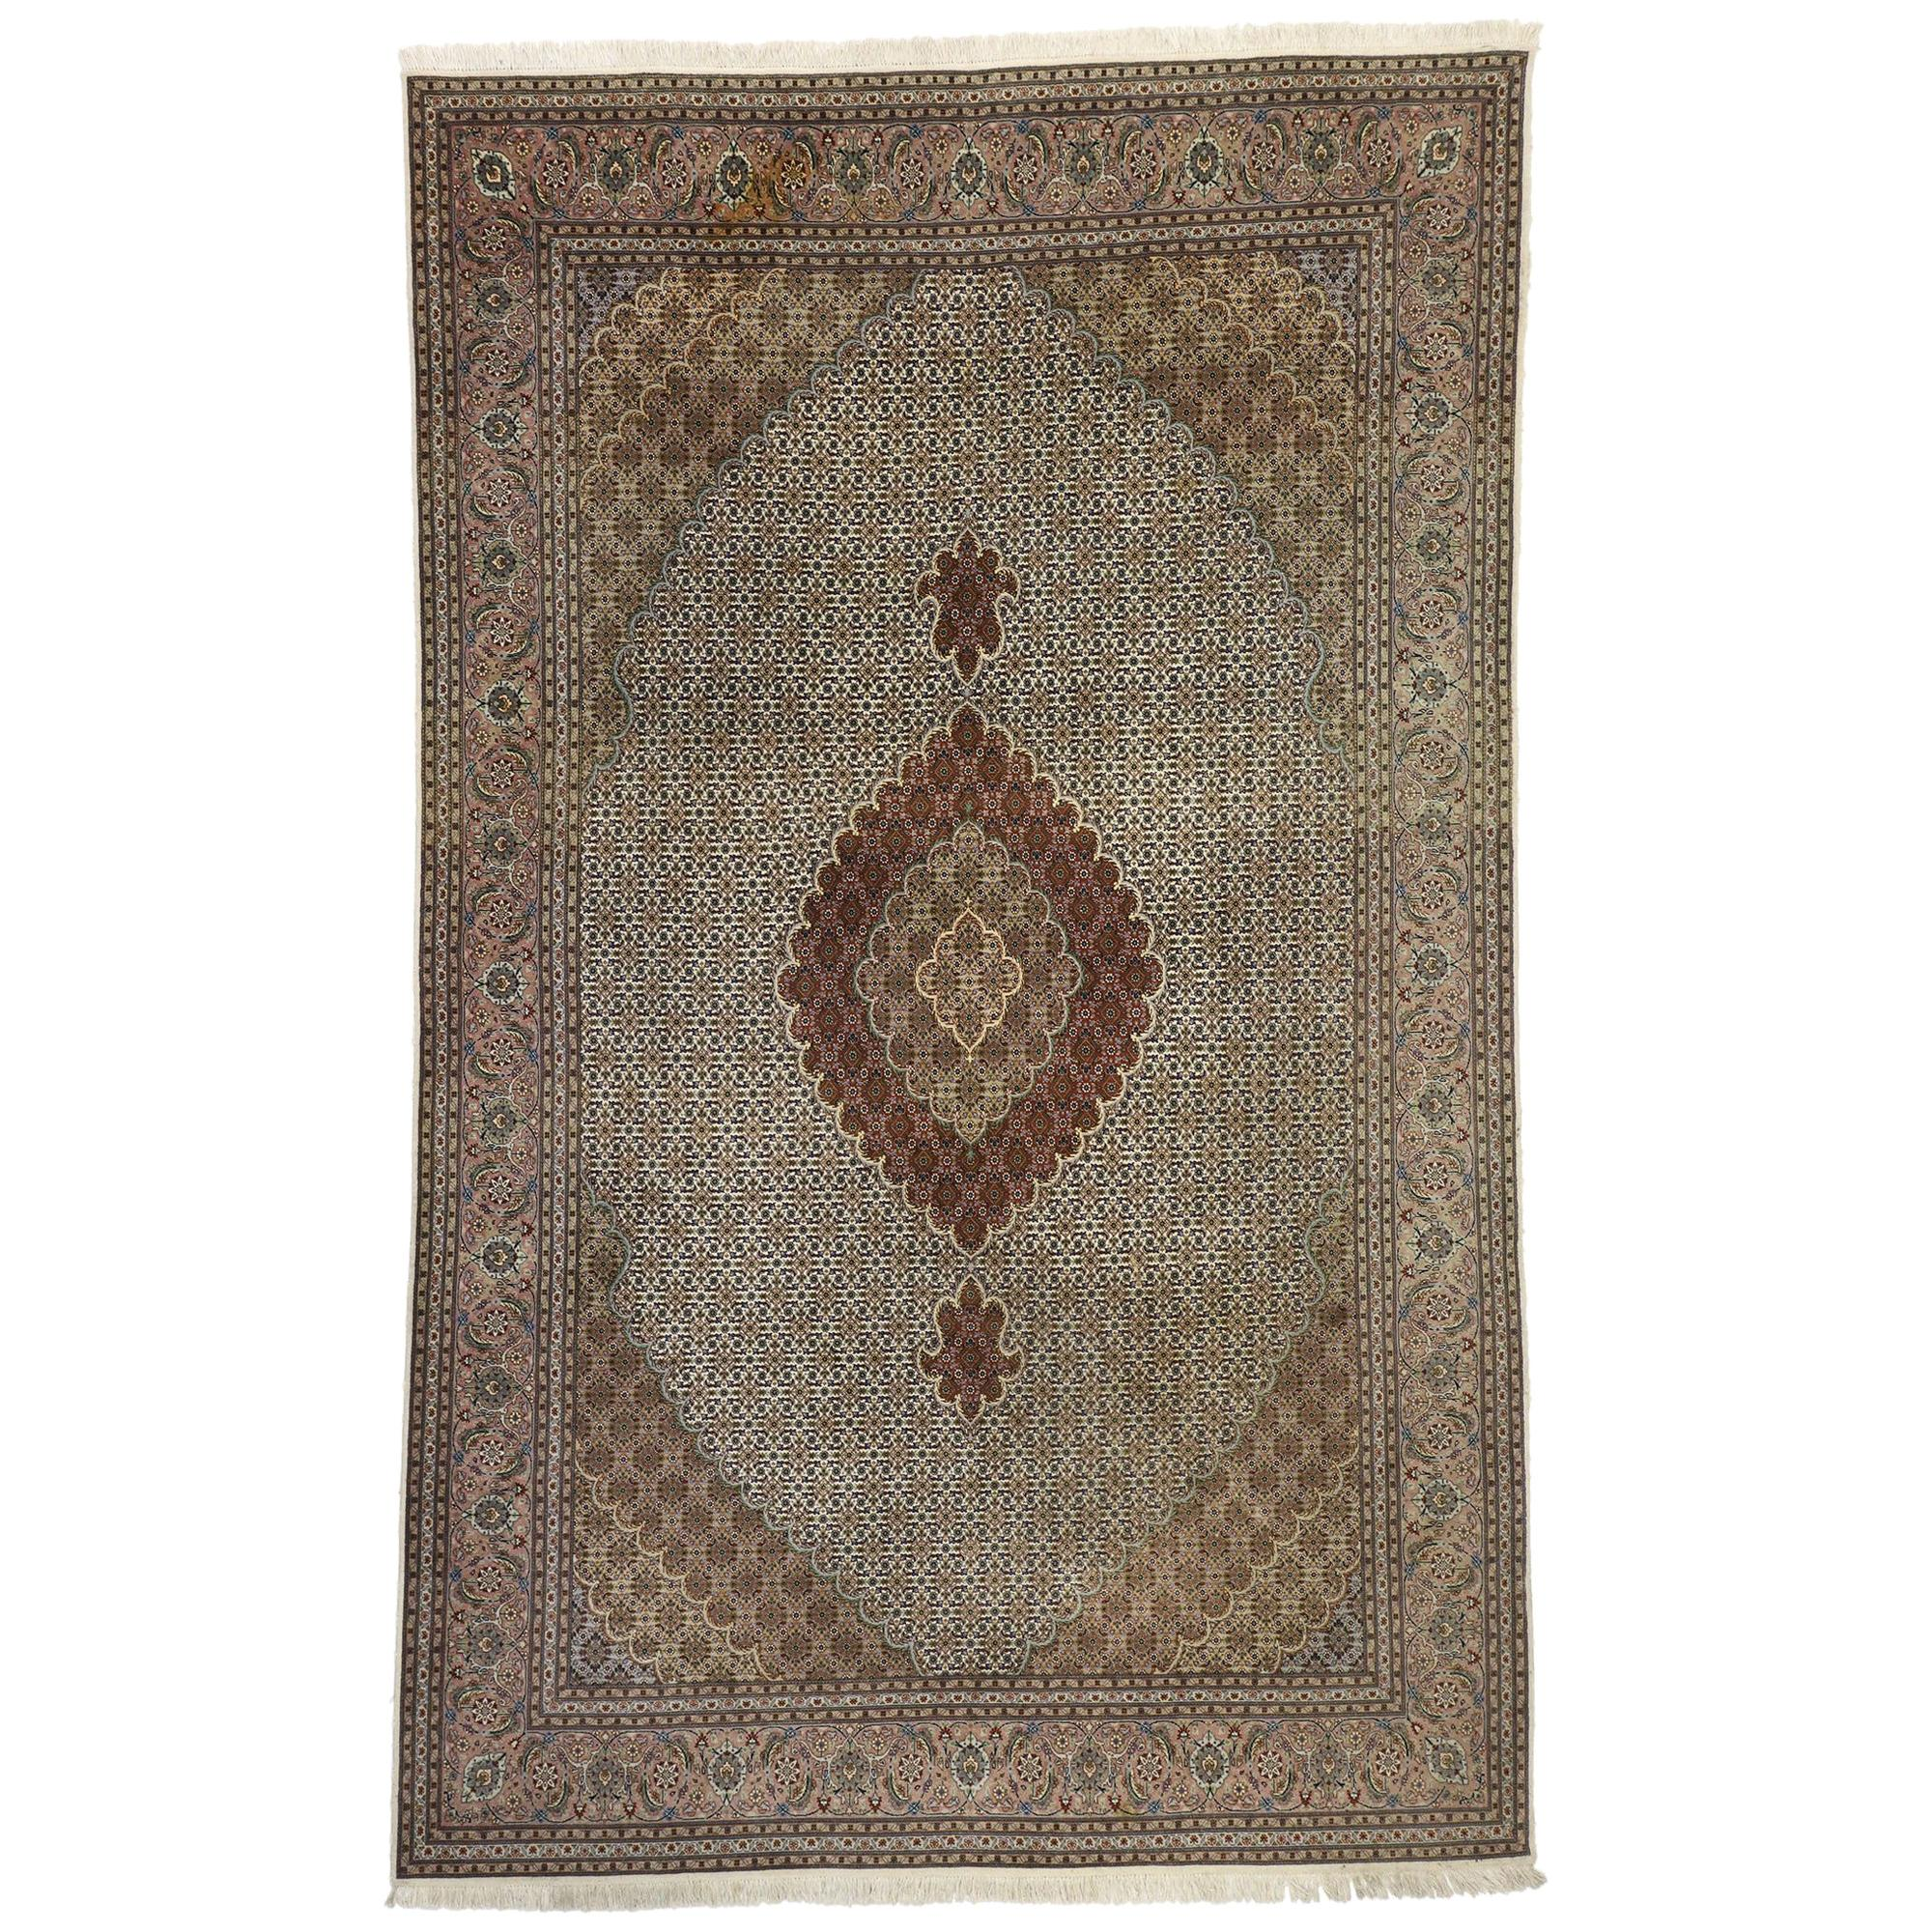 Vintage Persian Tabriz Rug with Mahi Fish Design